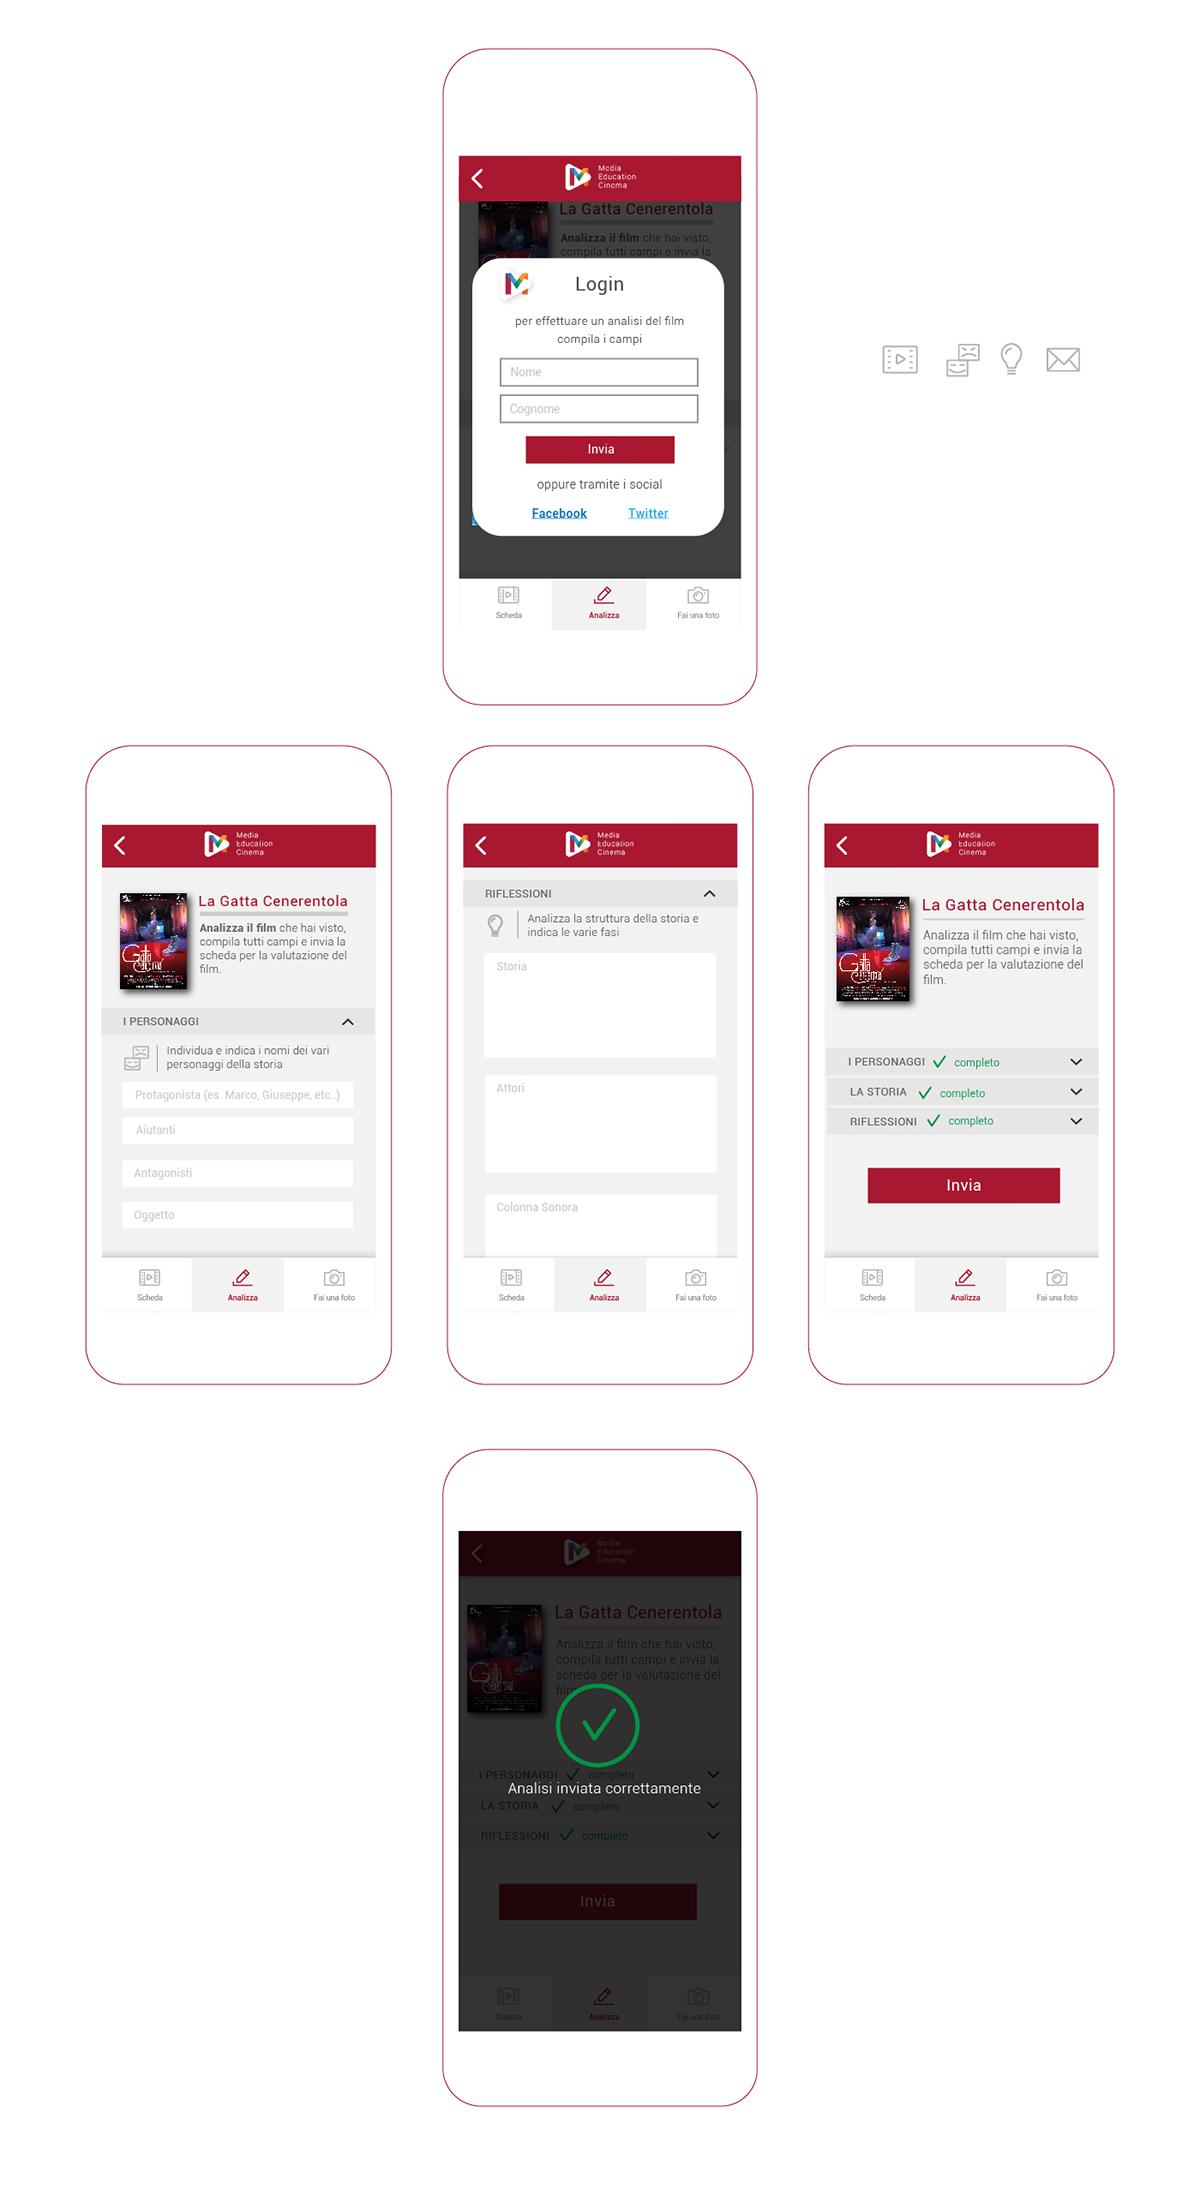 App Di Design ui/ux design - media education cinema app on student show